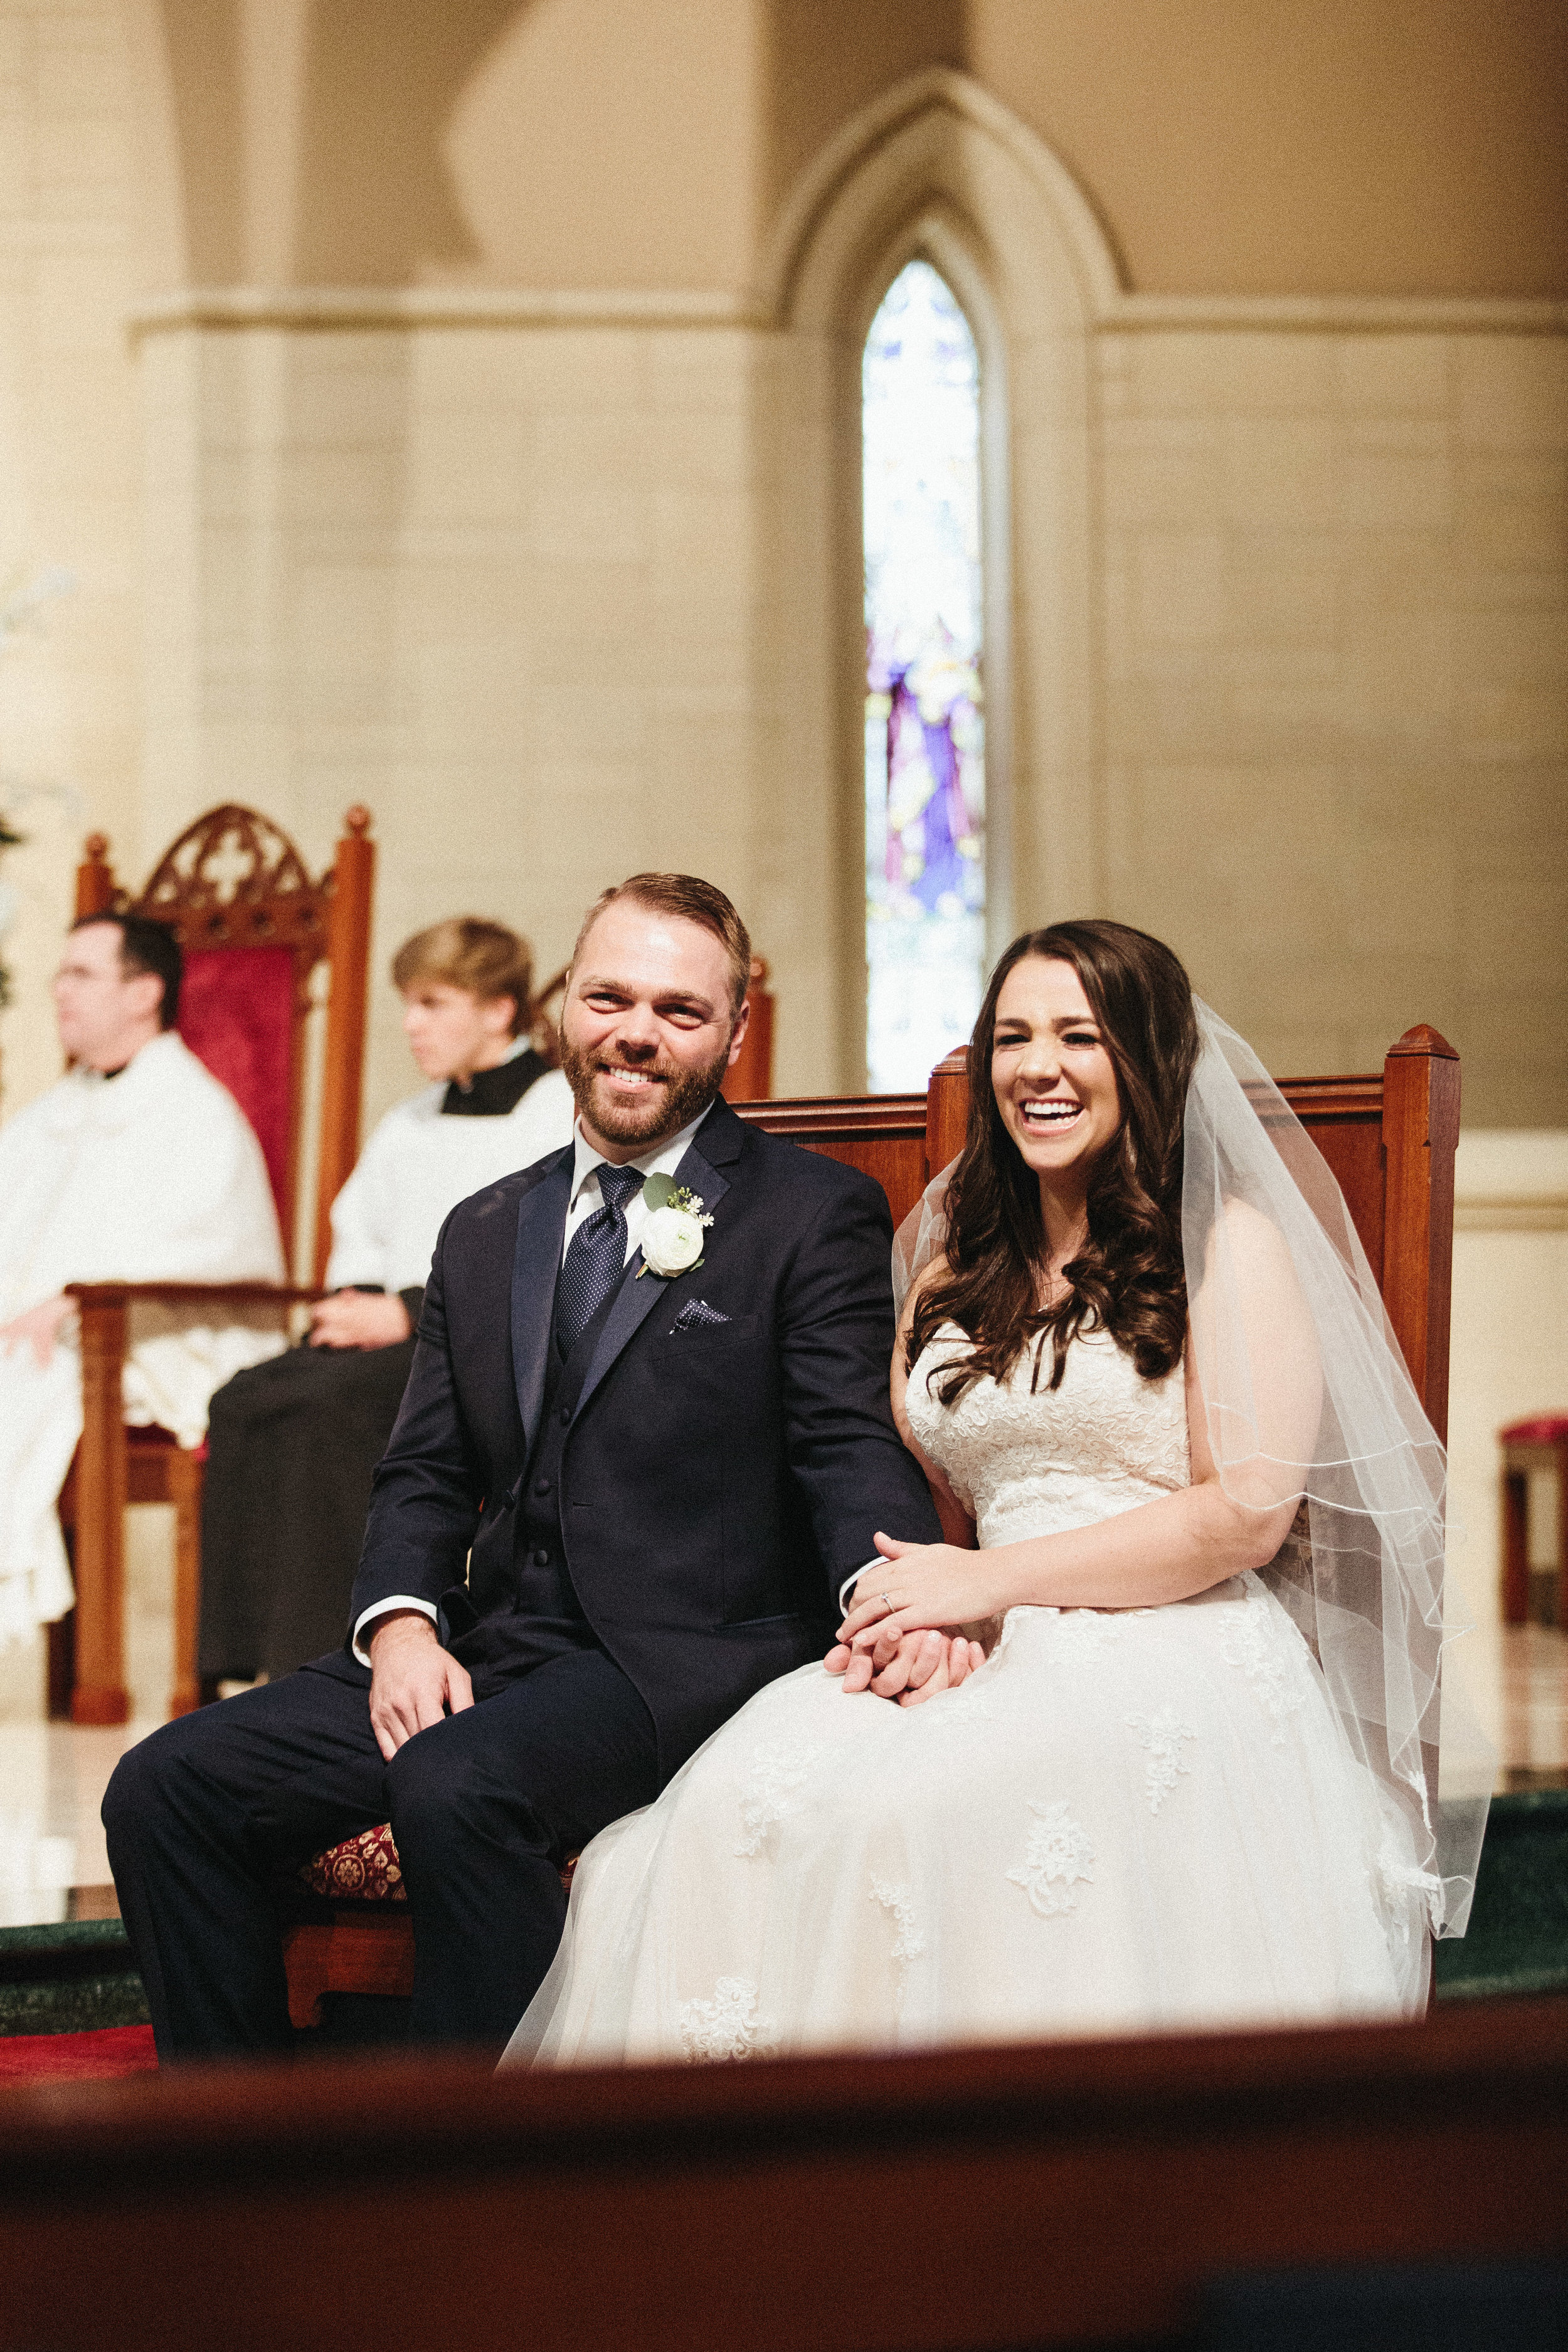 roswell_st_peter_chanel_catholic_avalon_hotel_alpharetta_wedding-1468.jpg